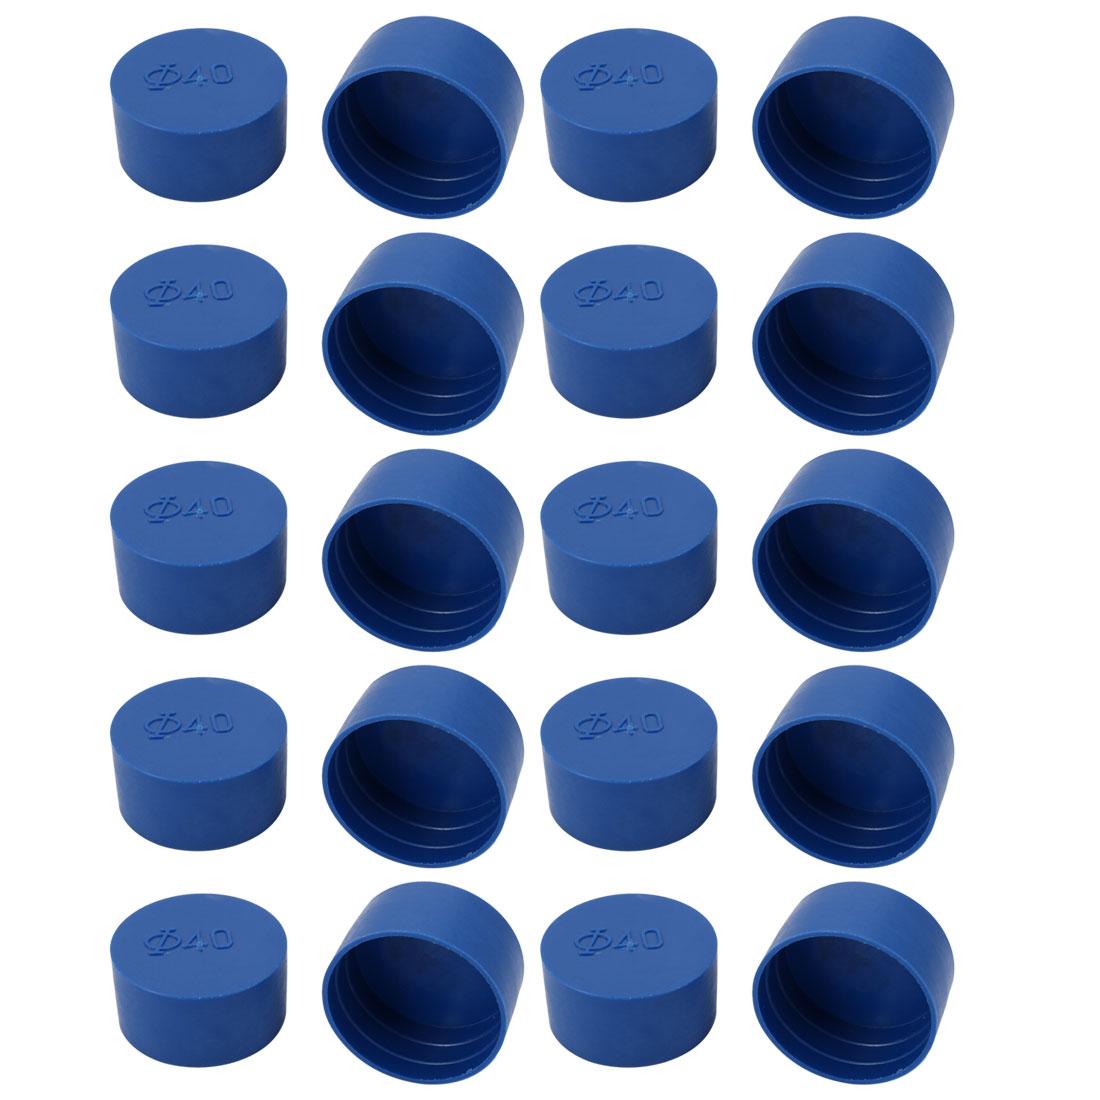 20pcs 40mm Inner Dia PE Plastic End Cap Bolt Thread Protector Tube Cover Blue